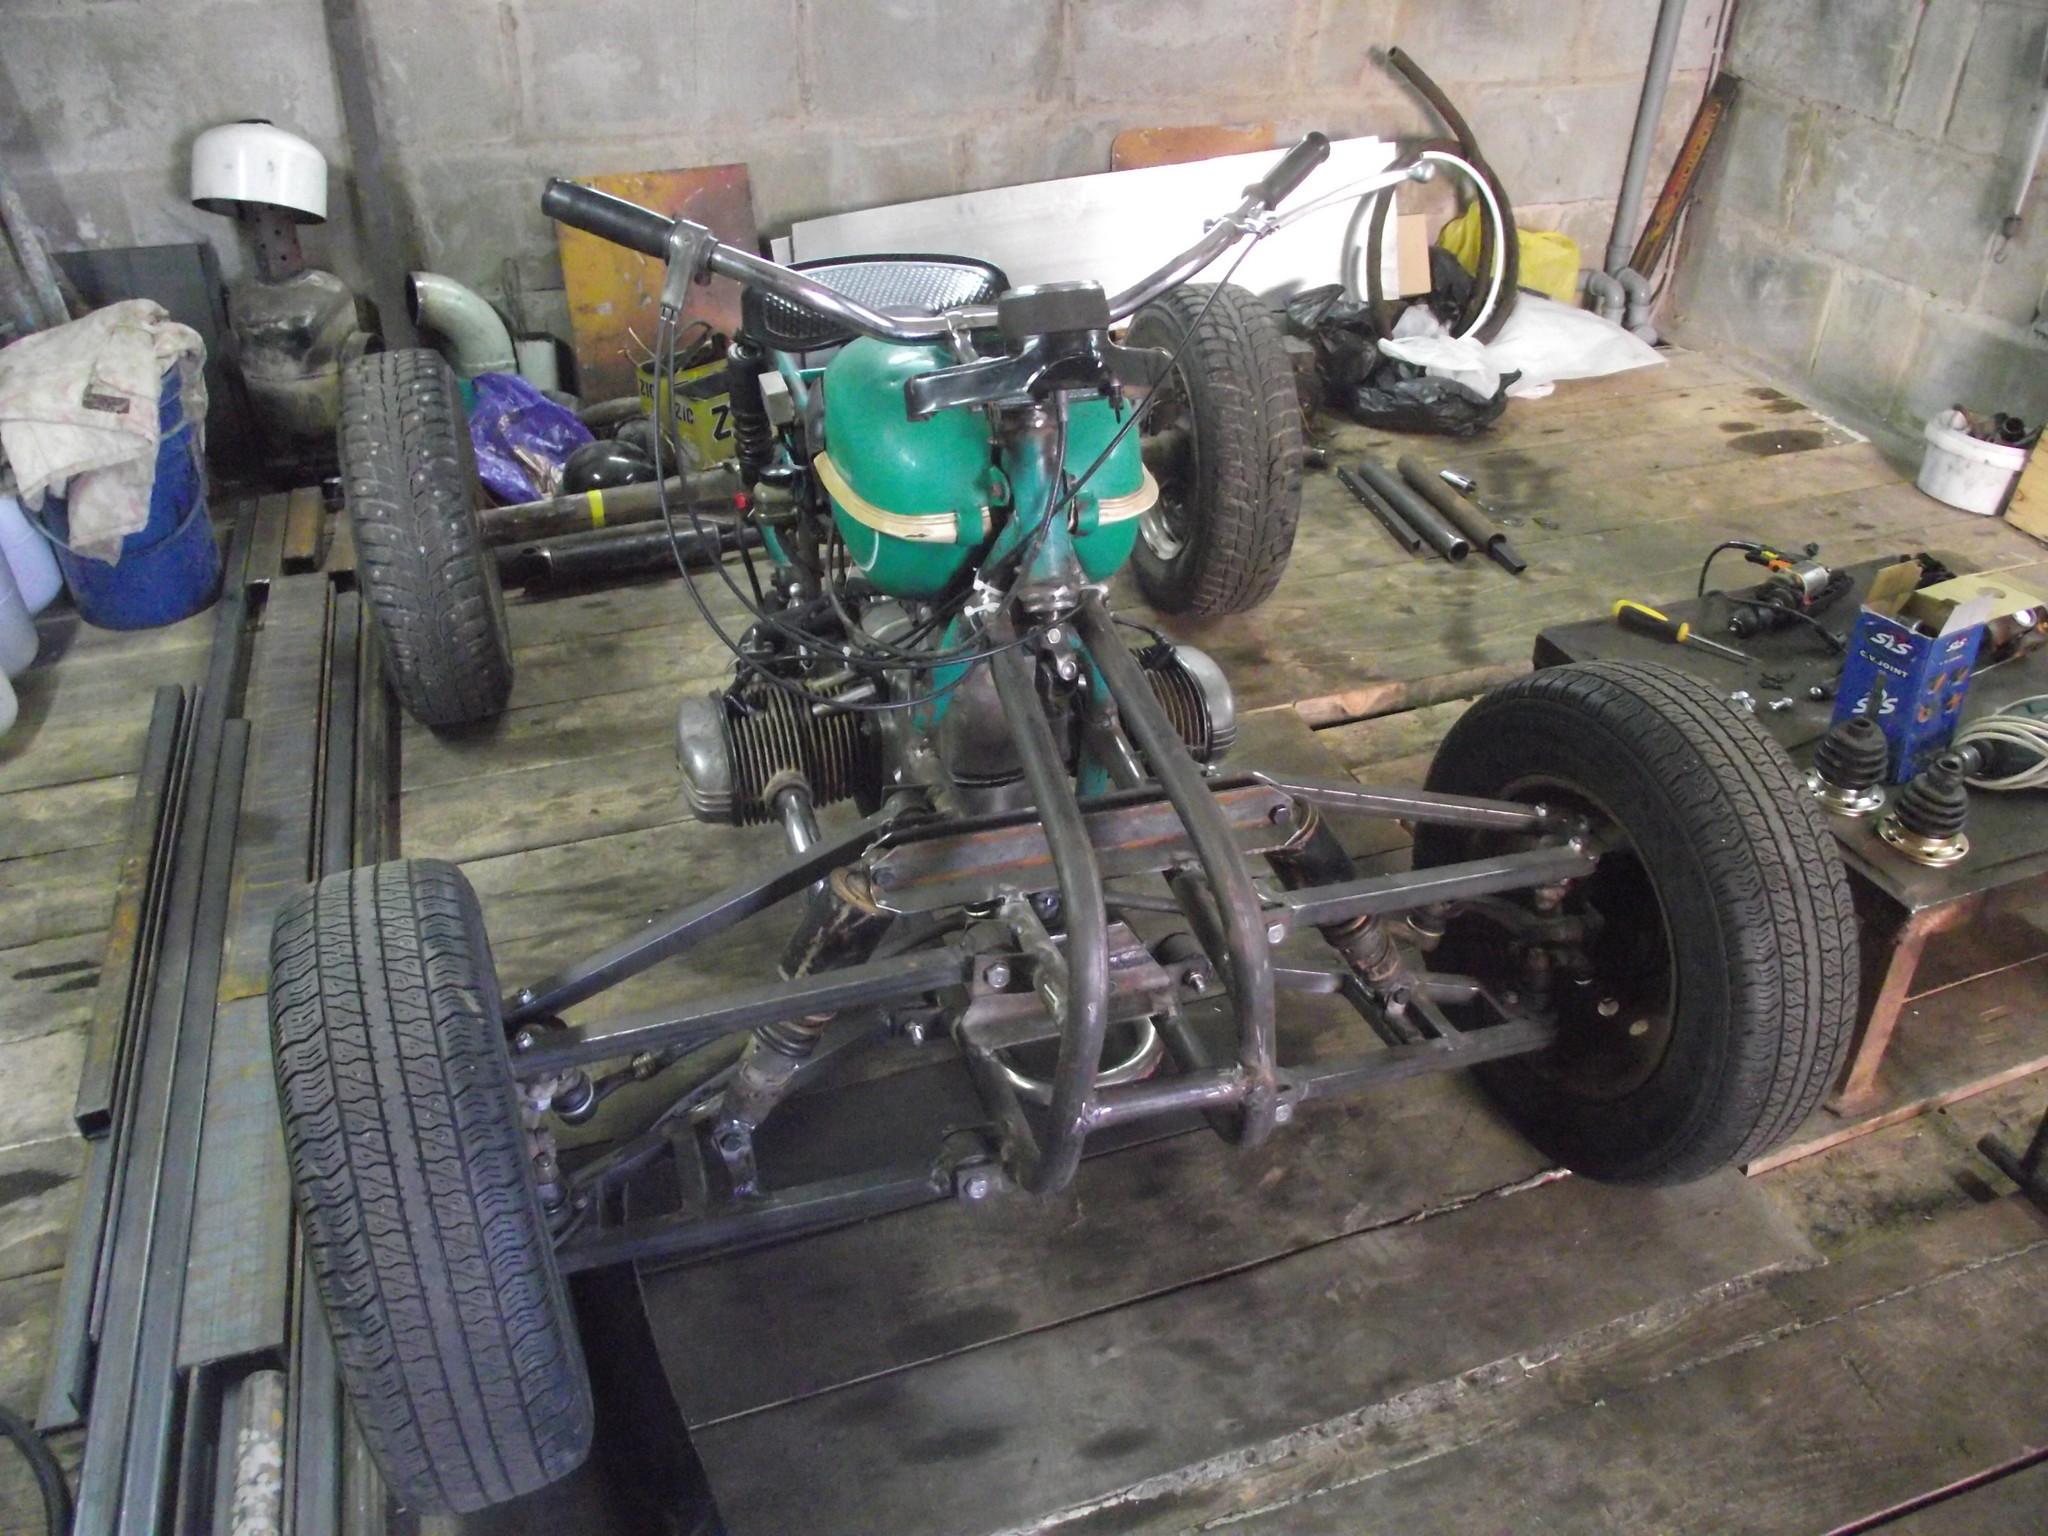 Чертежи квадроцикла на базе «Урала» - Квадроциклы 59